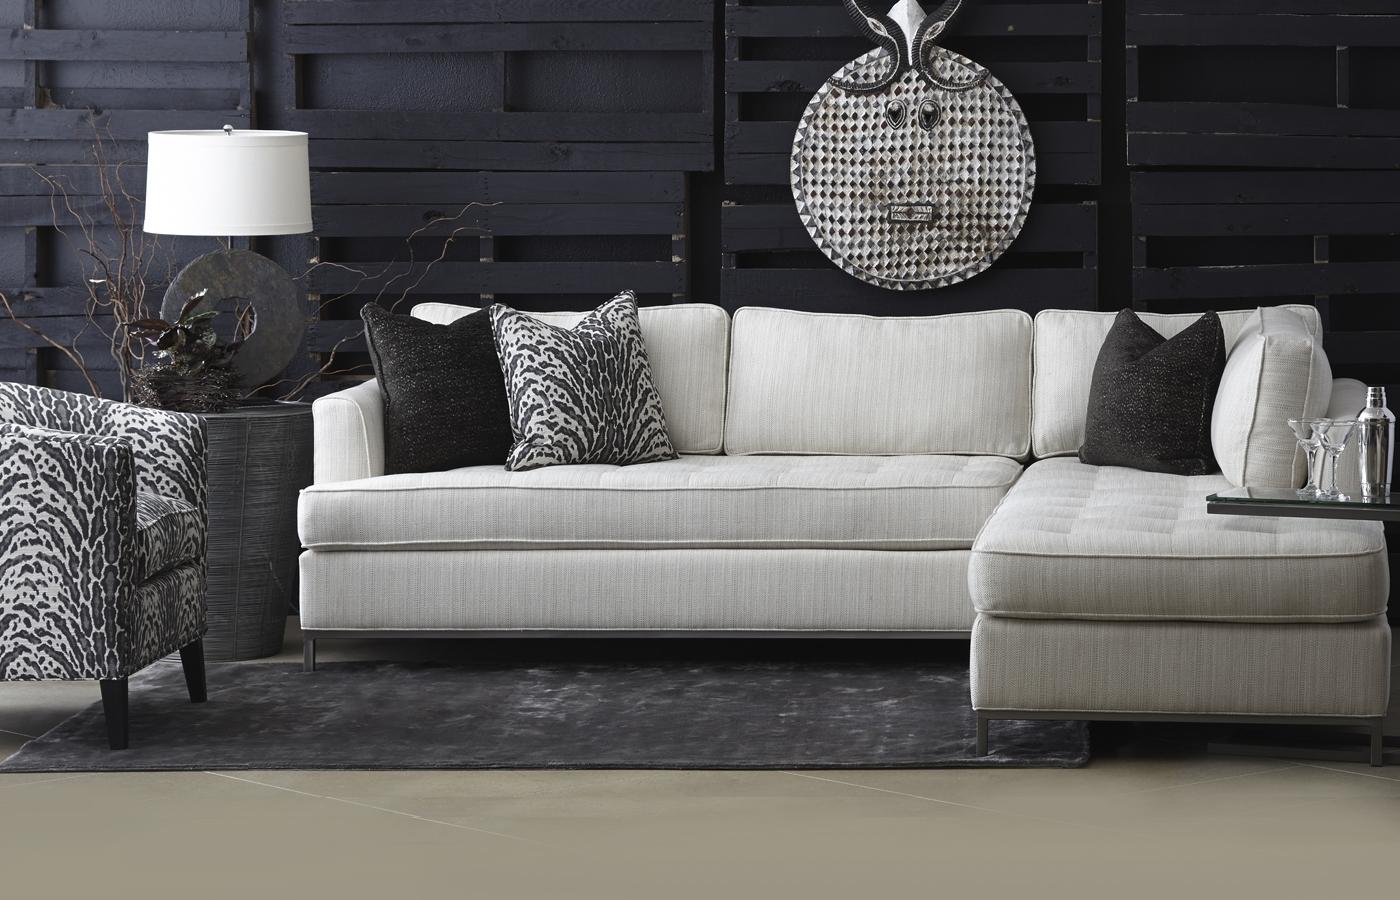 Norwalk Furniture Tribeca Sectional | Norwalk | Pinterest | Norwalk With Regard To Norwalk Sofas (View 4 of 10)